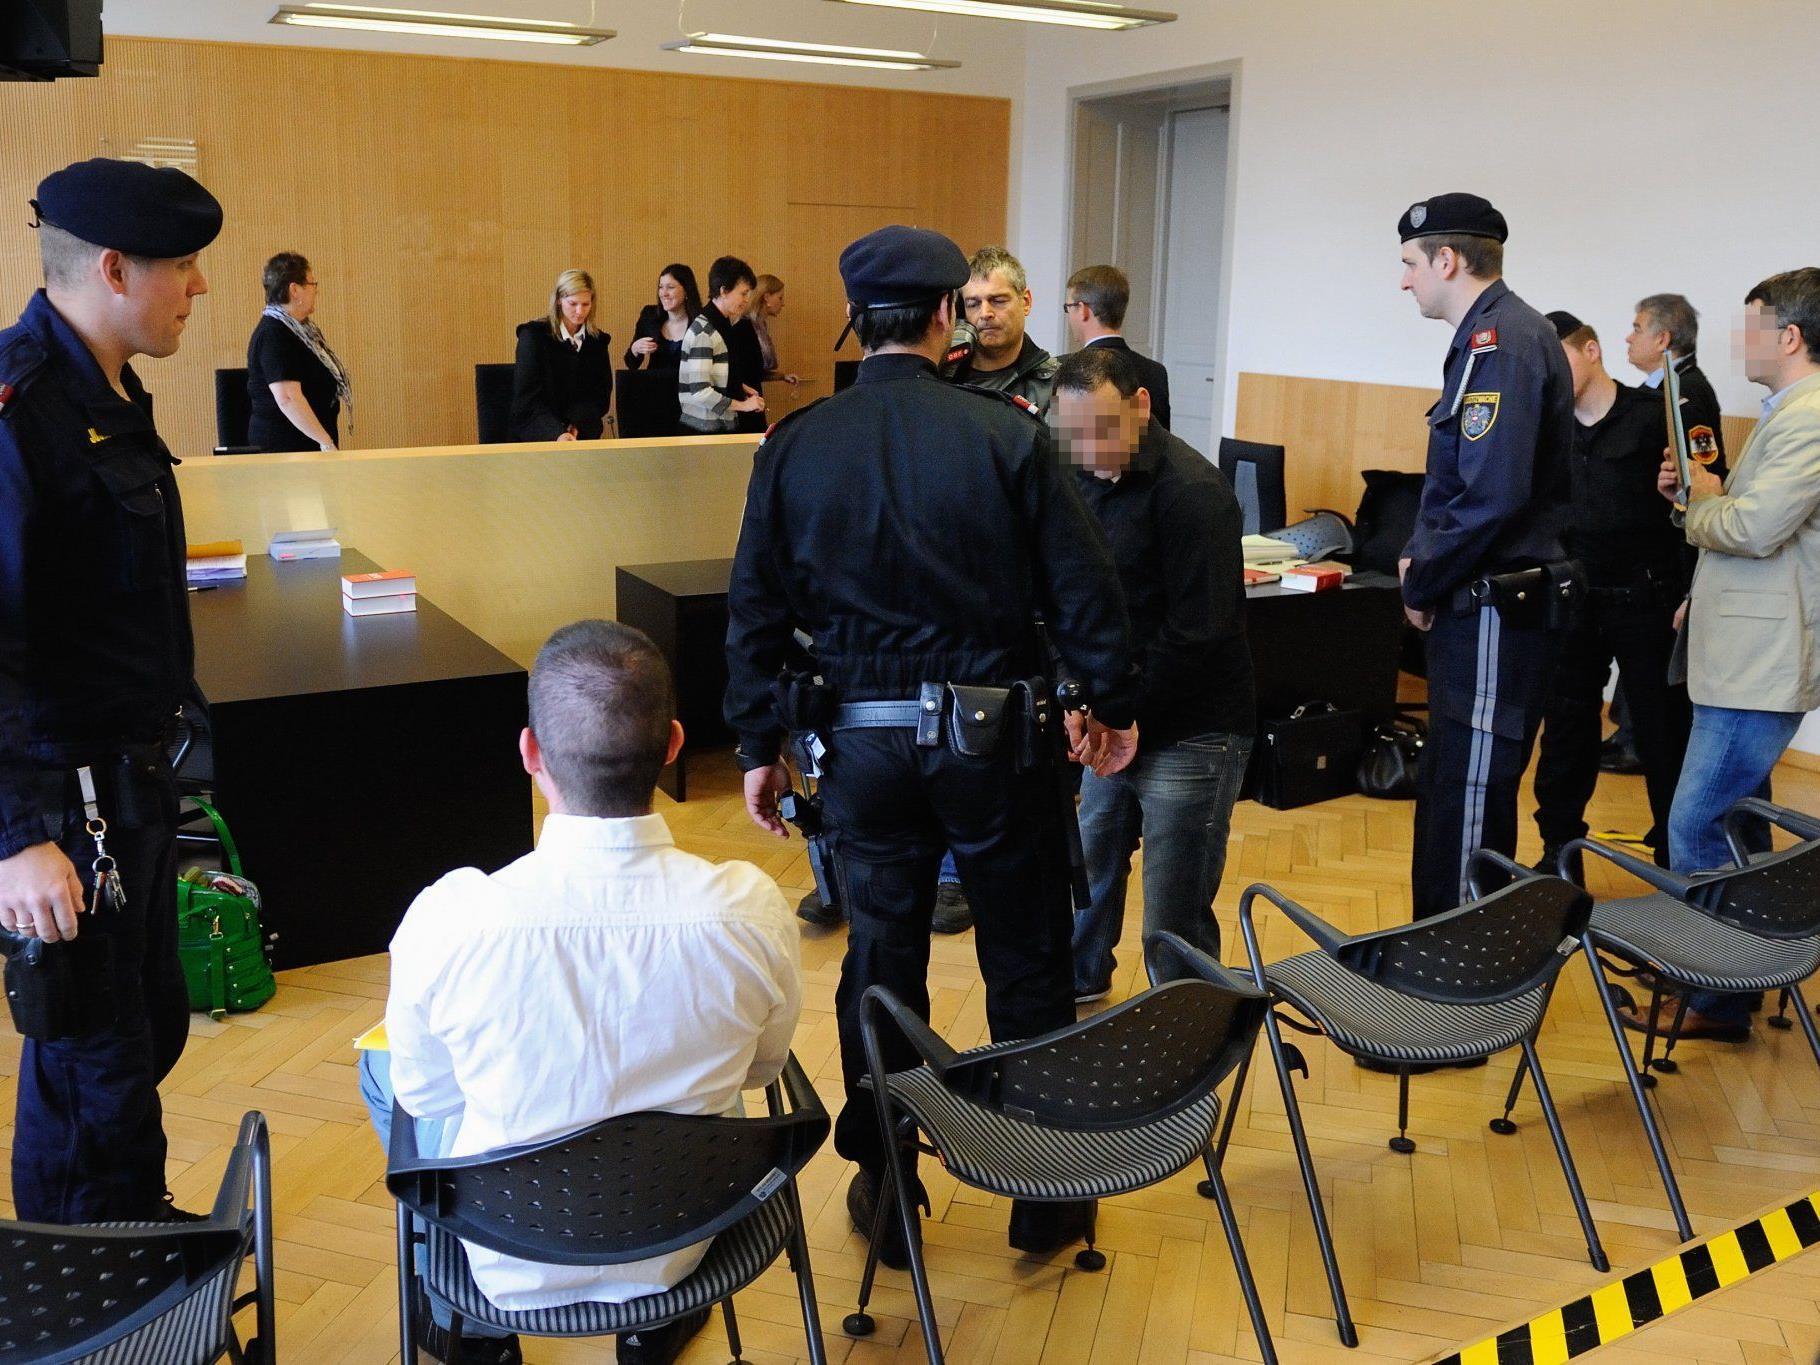 Drei Männer wegen versuchter schwerer Erpressung vor dem Landesgericht in Feldkirch